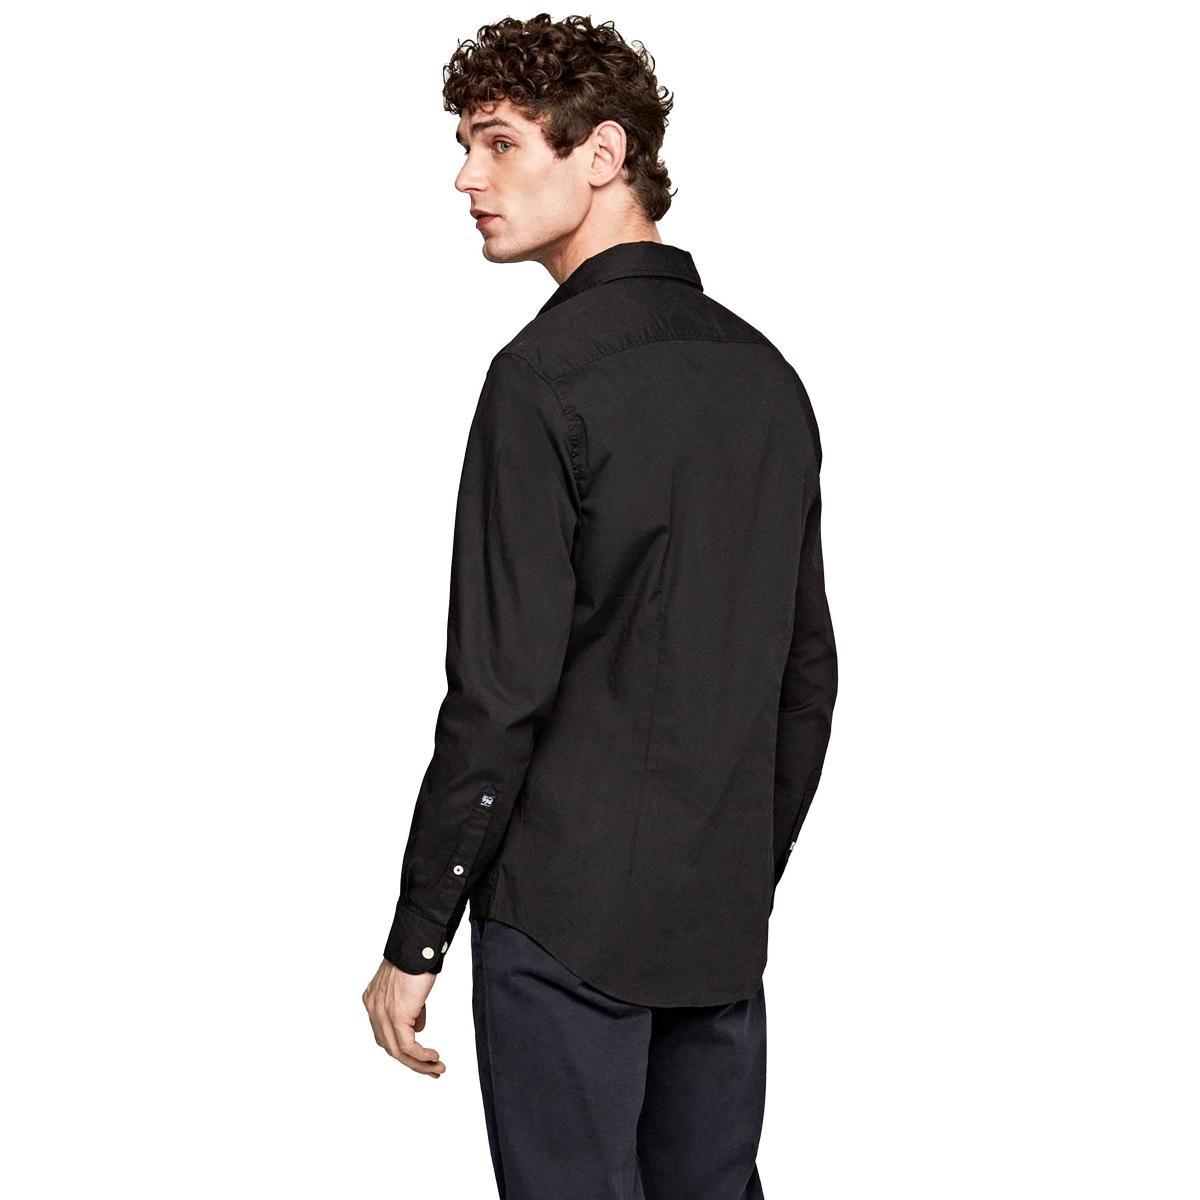 Camicia Pepe Jeans Ridleys I basic con taschino da uomo rif. PM303158 RIDLEYS I